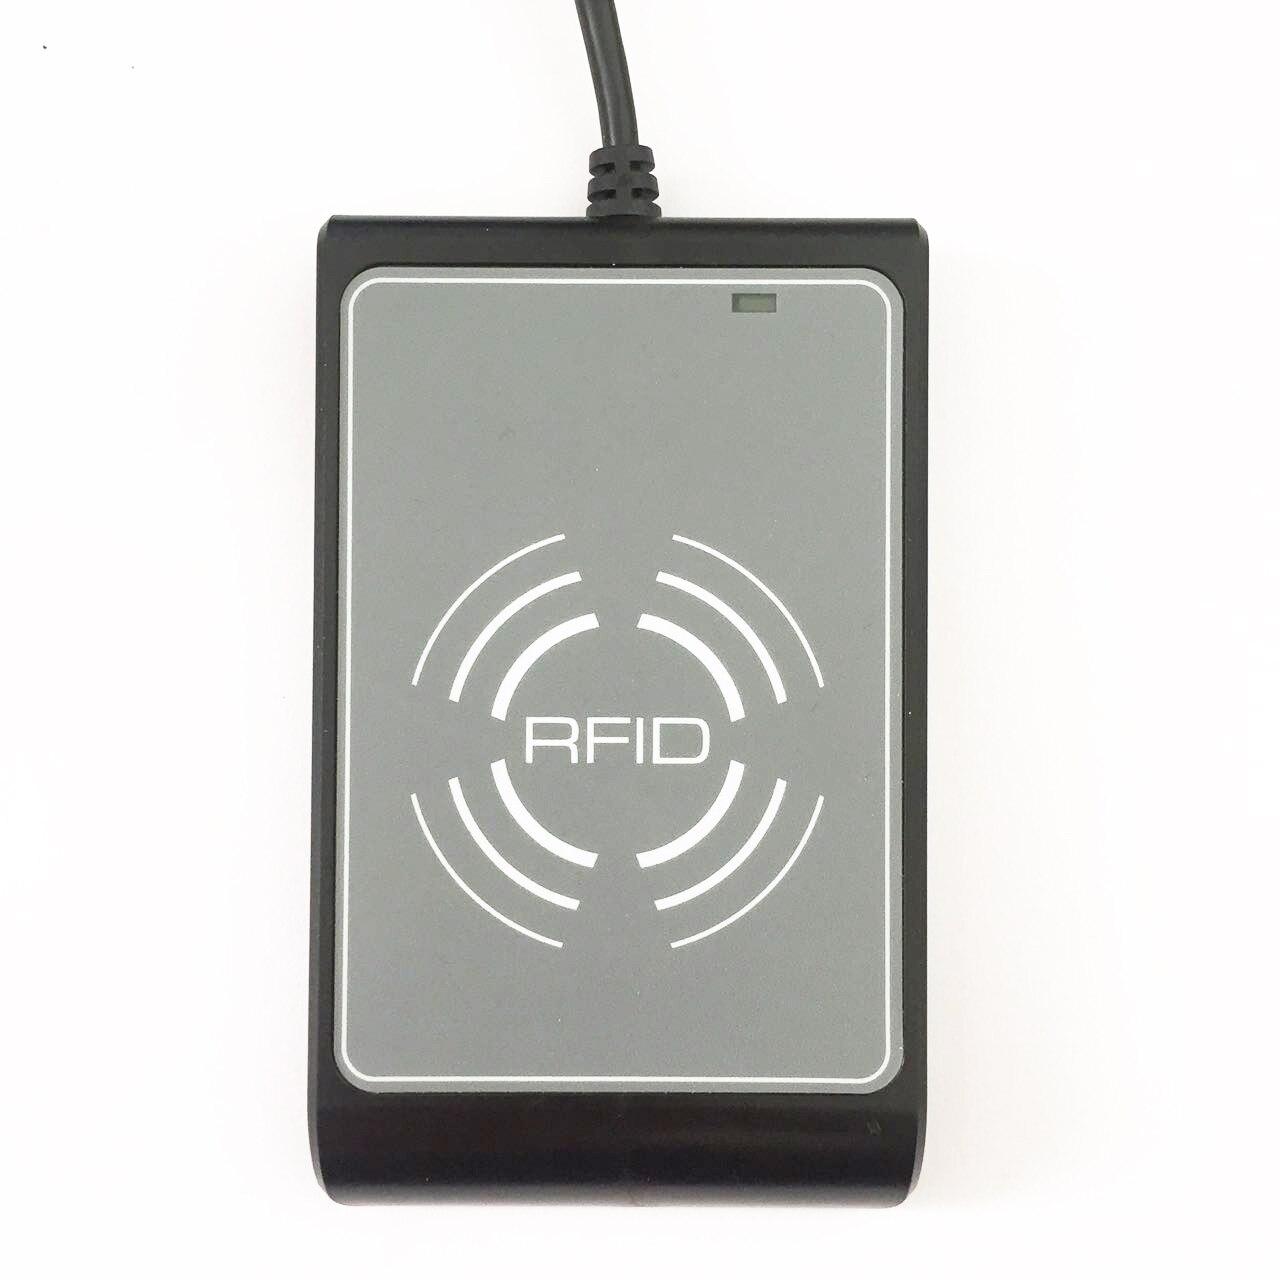 RFID Desktop Reader Reader High Frequency USB Reader 13.56 MHz 15693 14443ARFID Desktop Reader Reader High Frequency USB Reader 13.56 MHz 15693 14443A